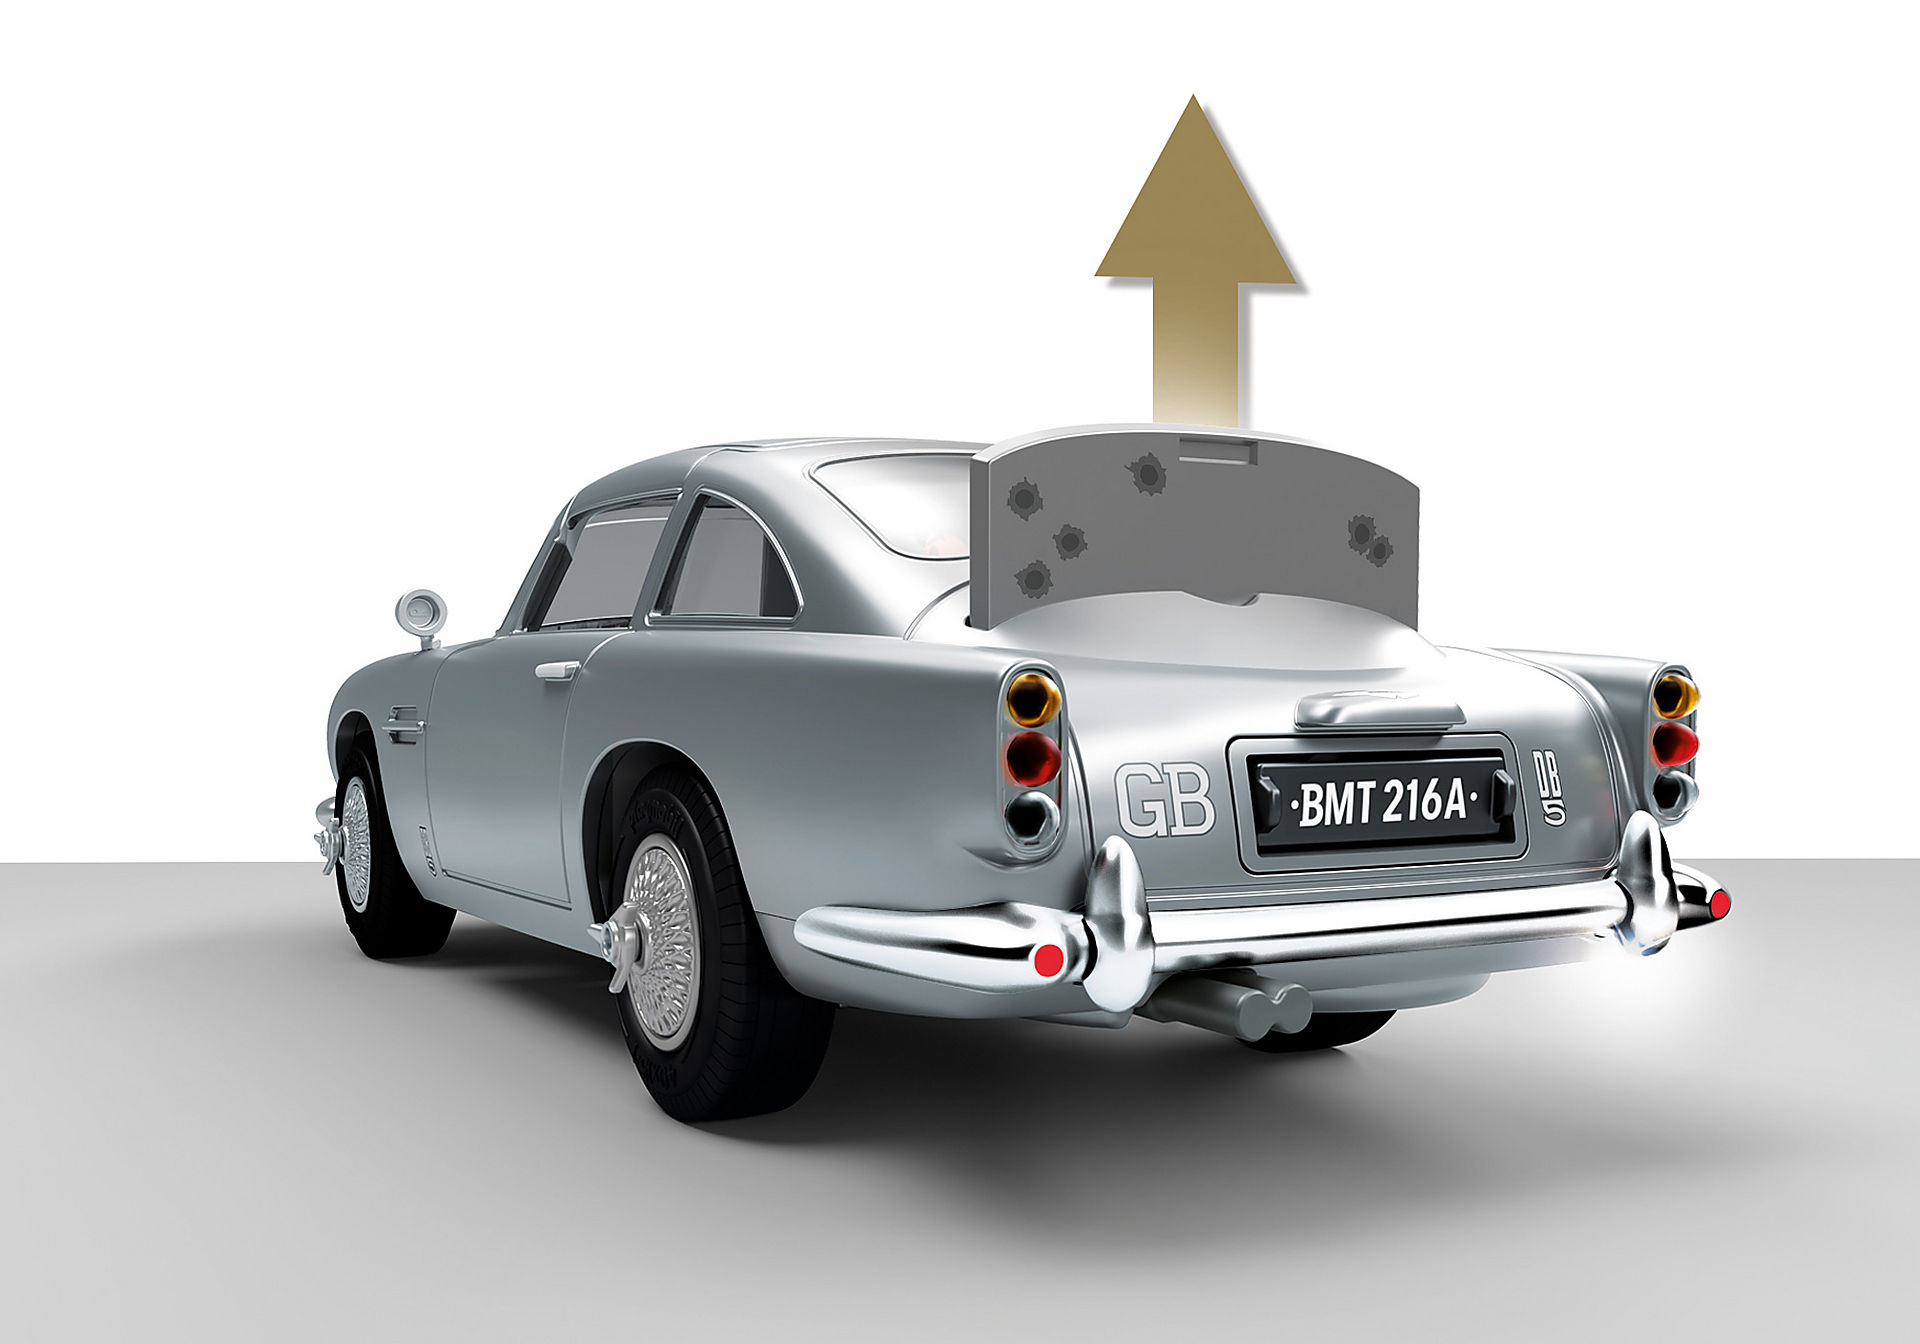 70578 James Bond Aston Martin DB5 - Edition Goldfinger zoom image7